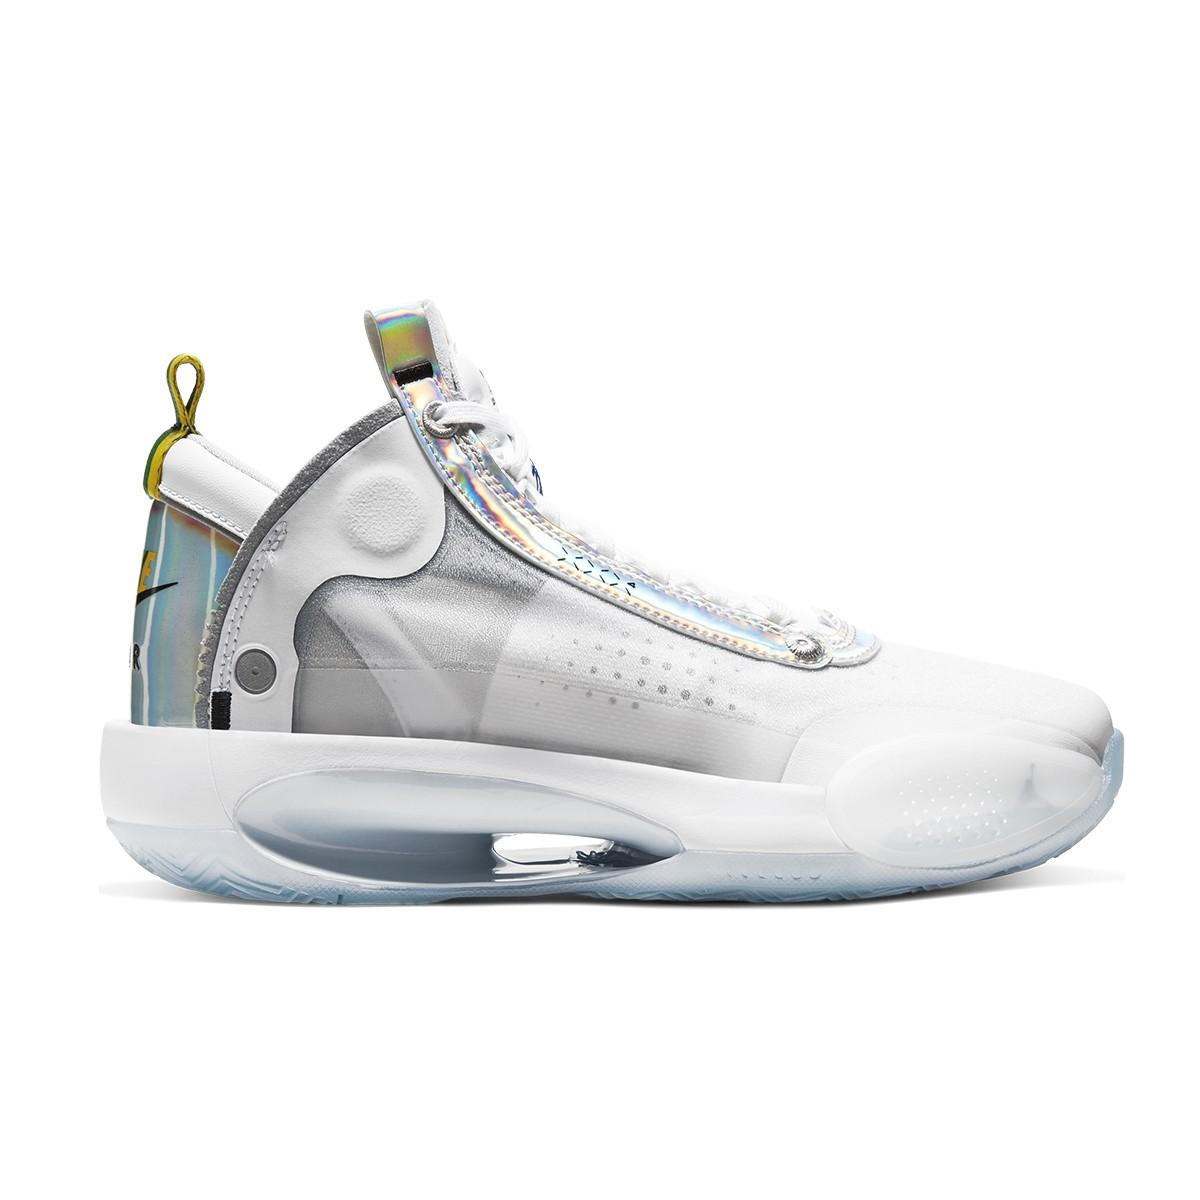 clon Es decir dinámica  Buy Air Jordan 34 GS 'White Iridiscent' Basketball shoes & sneakers